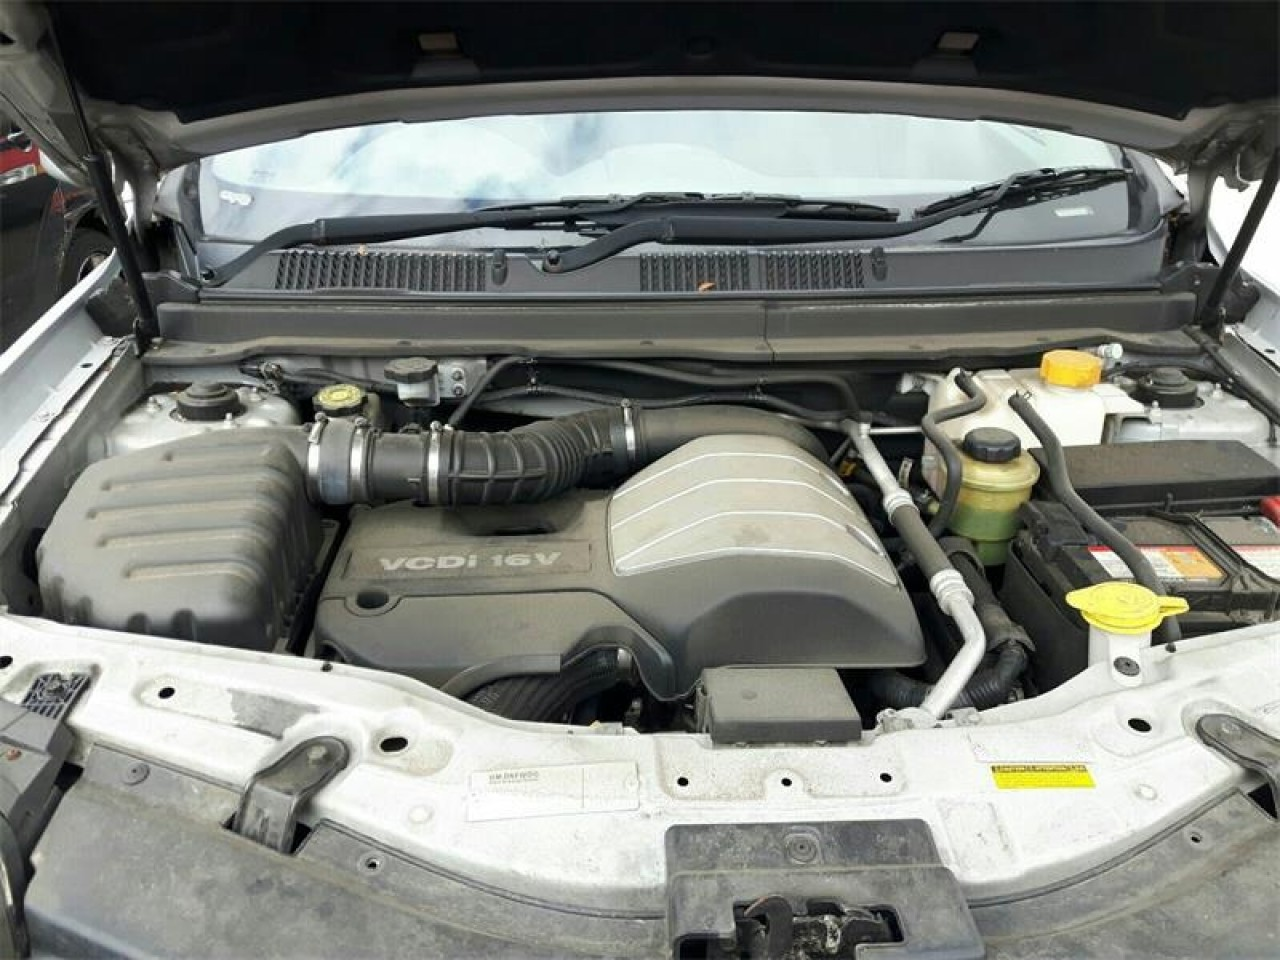 Amortizor capota Chevrolet Captiva 2008 SUV 2.0 VCDi